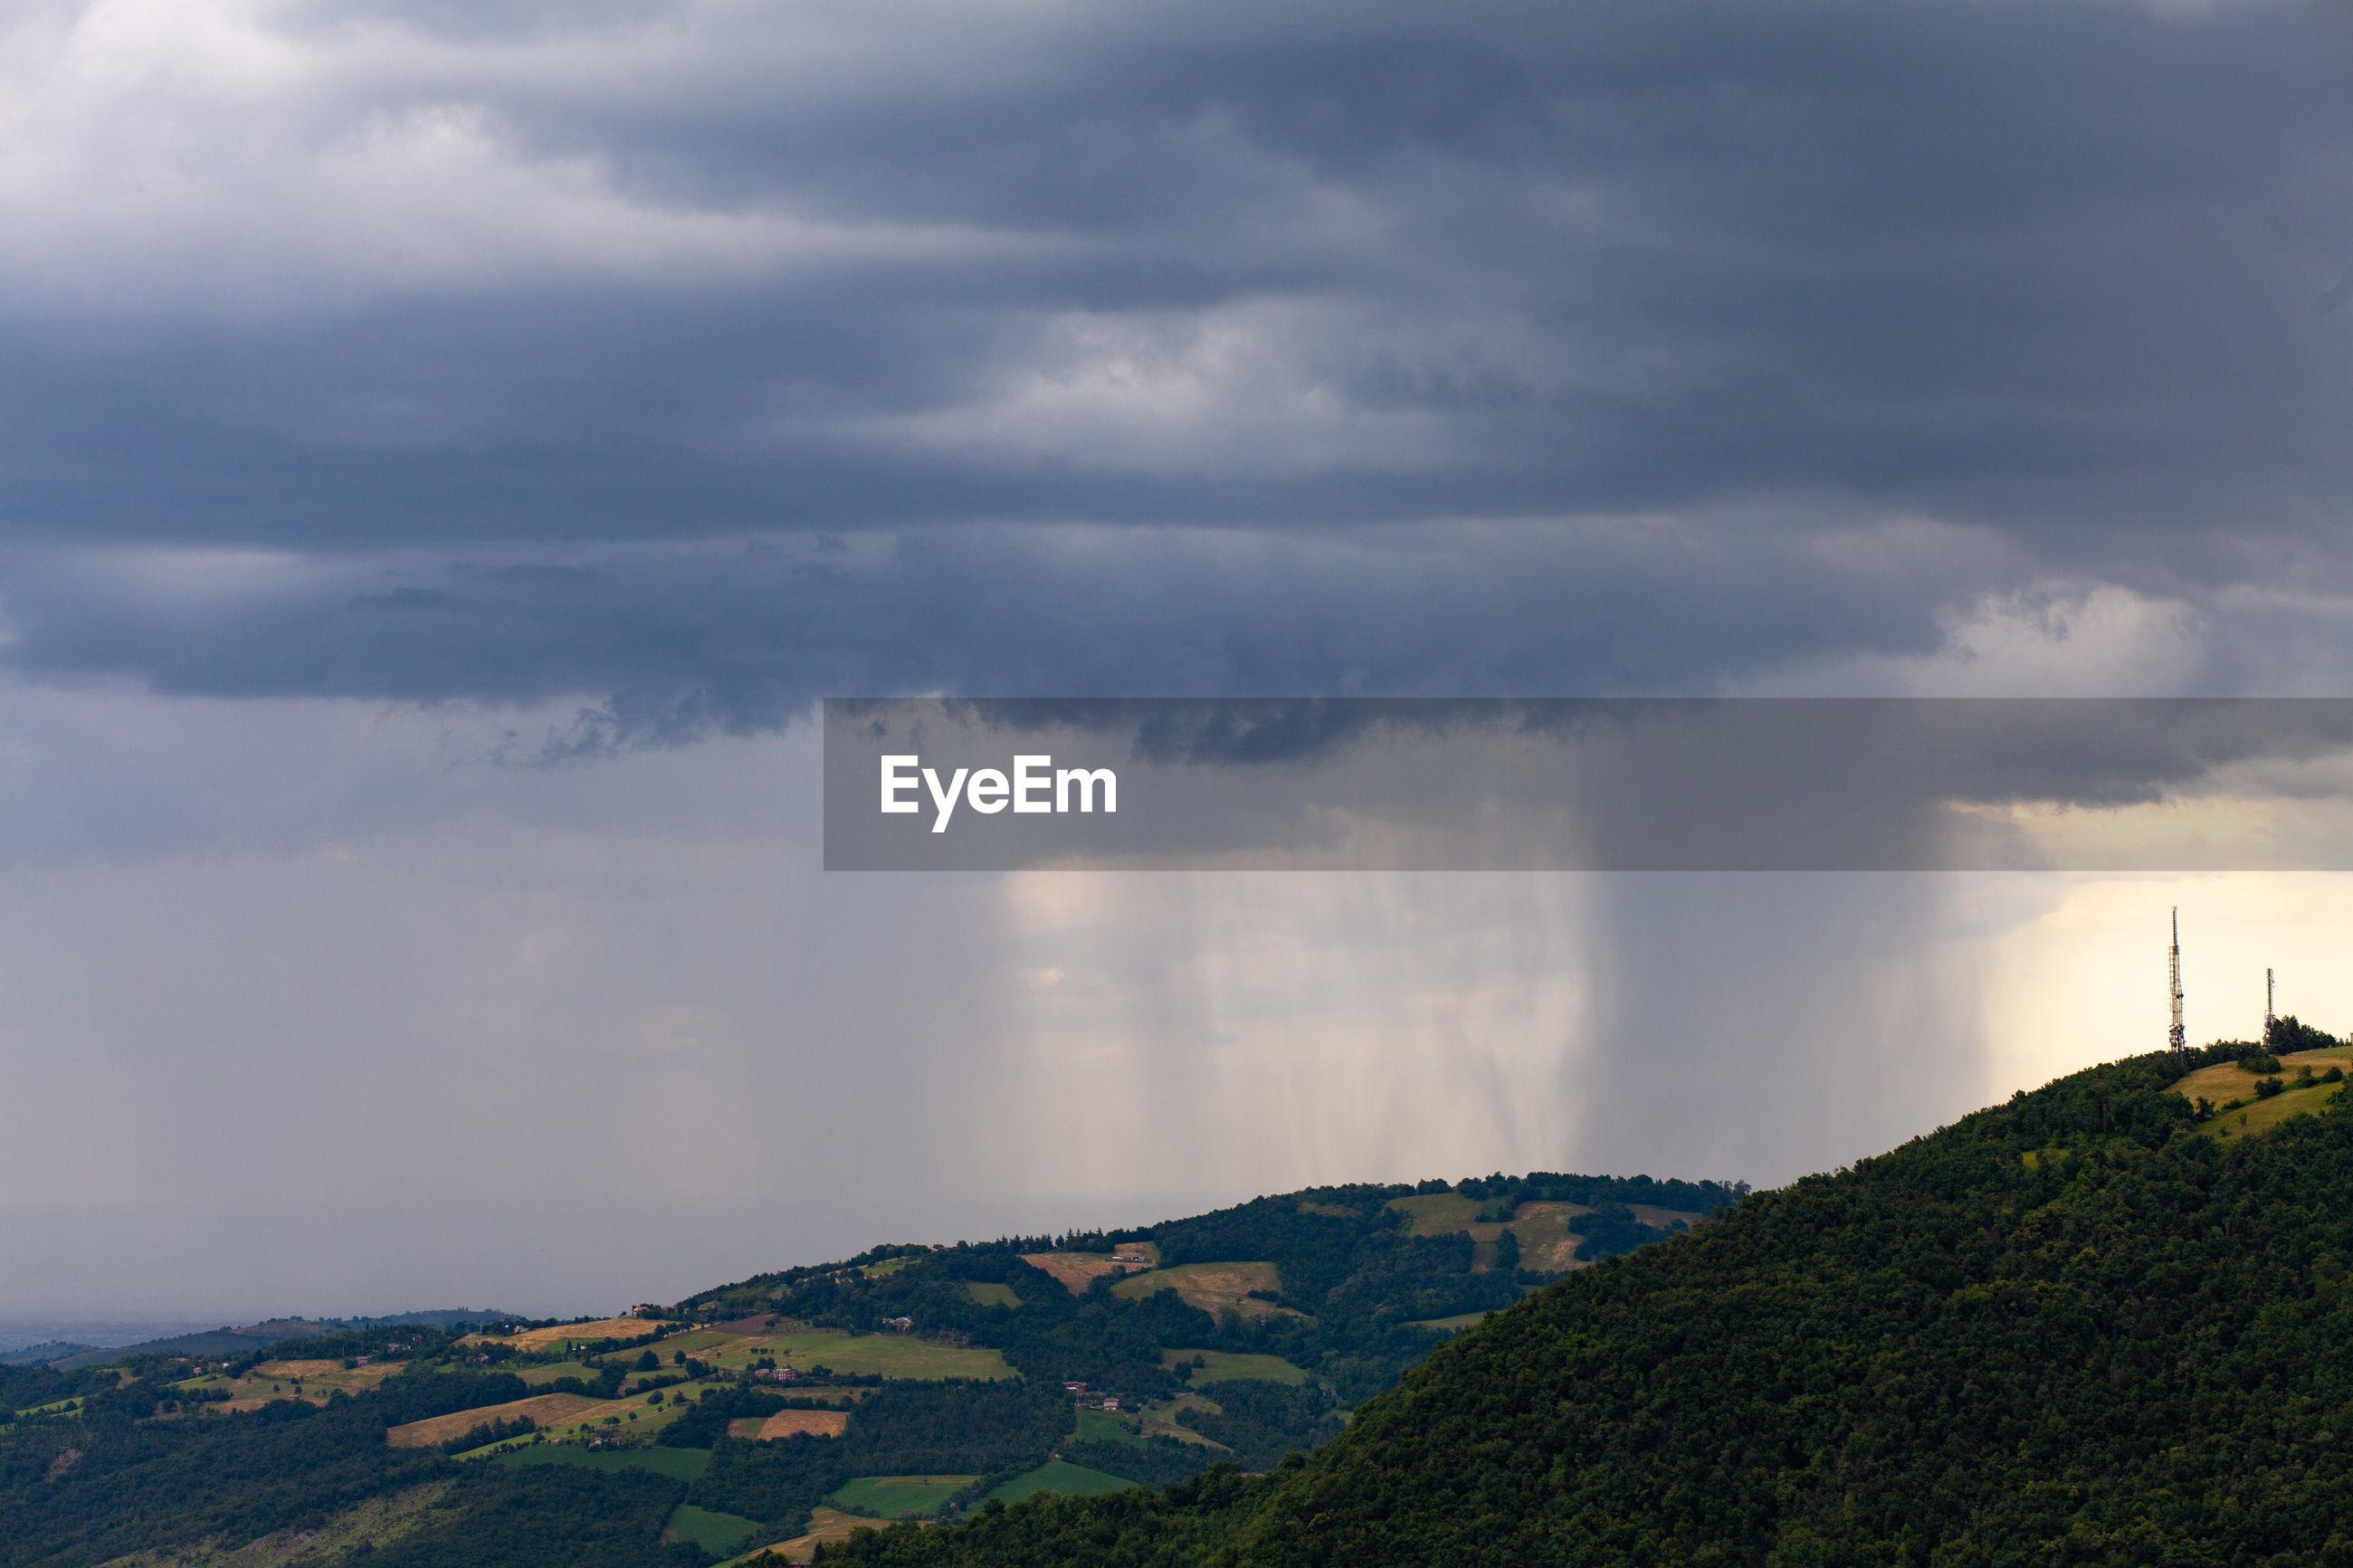 A storm on modena plain seen from little city of serramazzoni on the hills